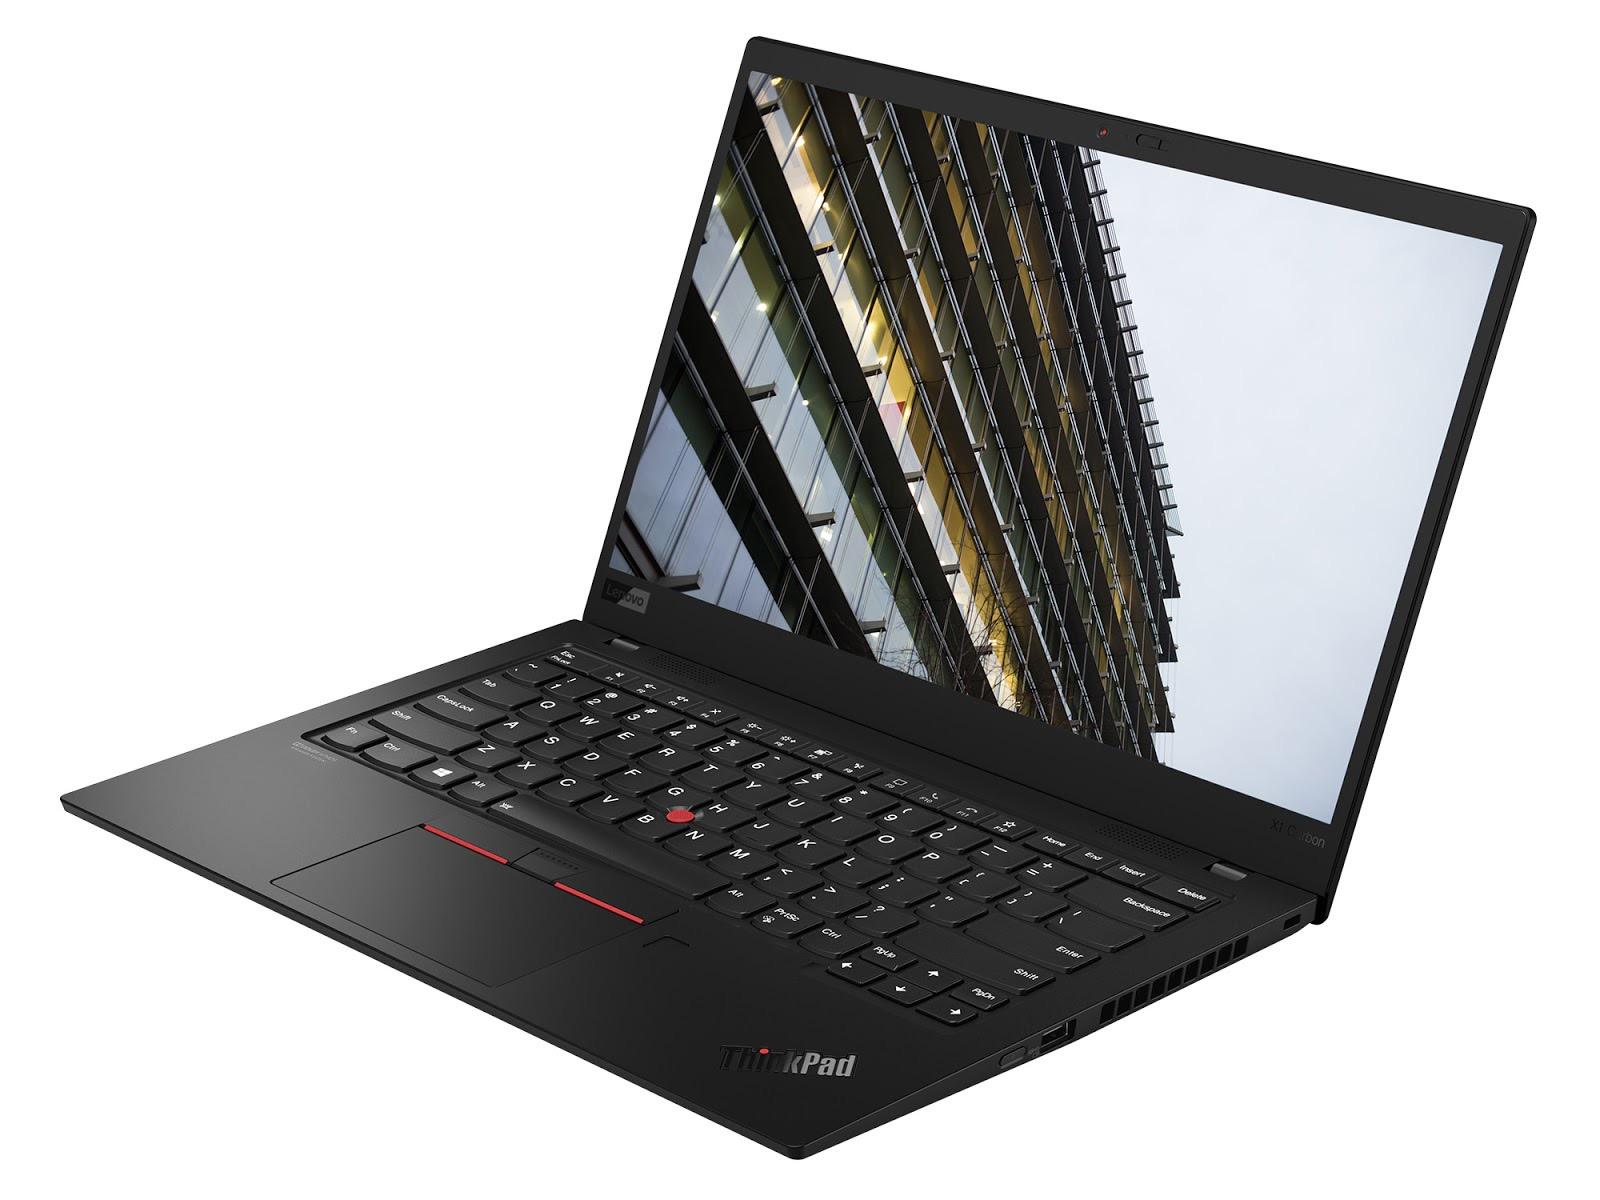 Фото 3. Ноутбук Lenovo ThinkPad X1 Carbon Gen 8 Black (20U90003RT)